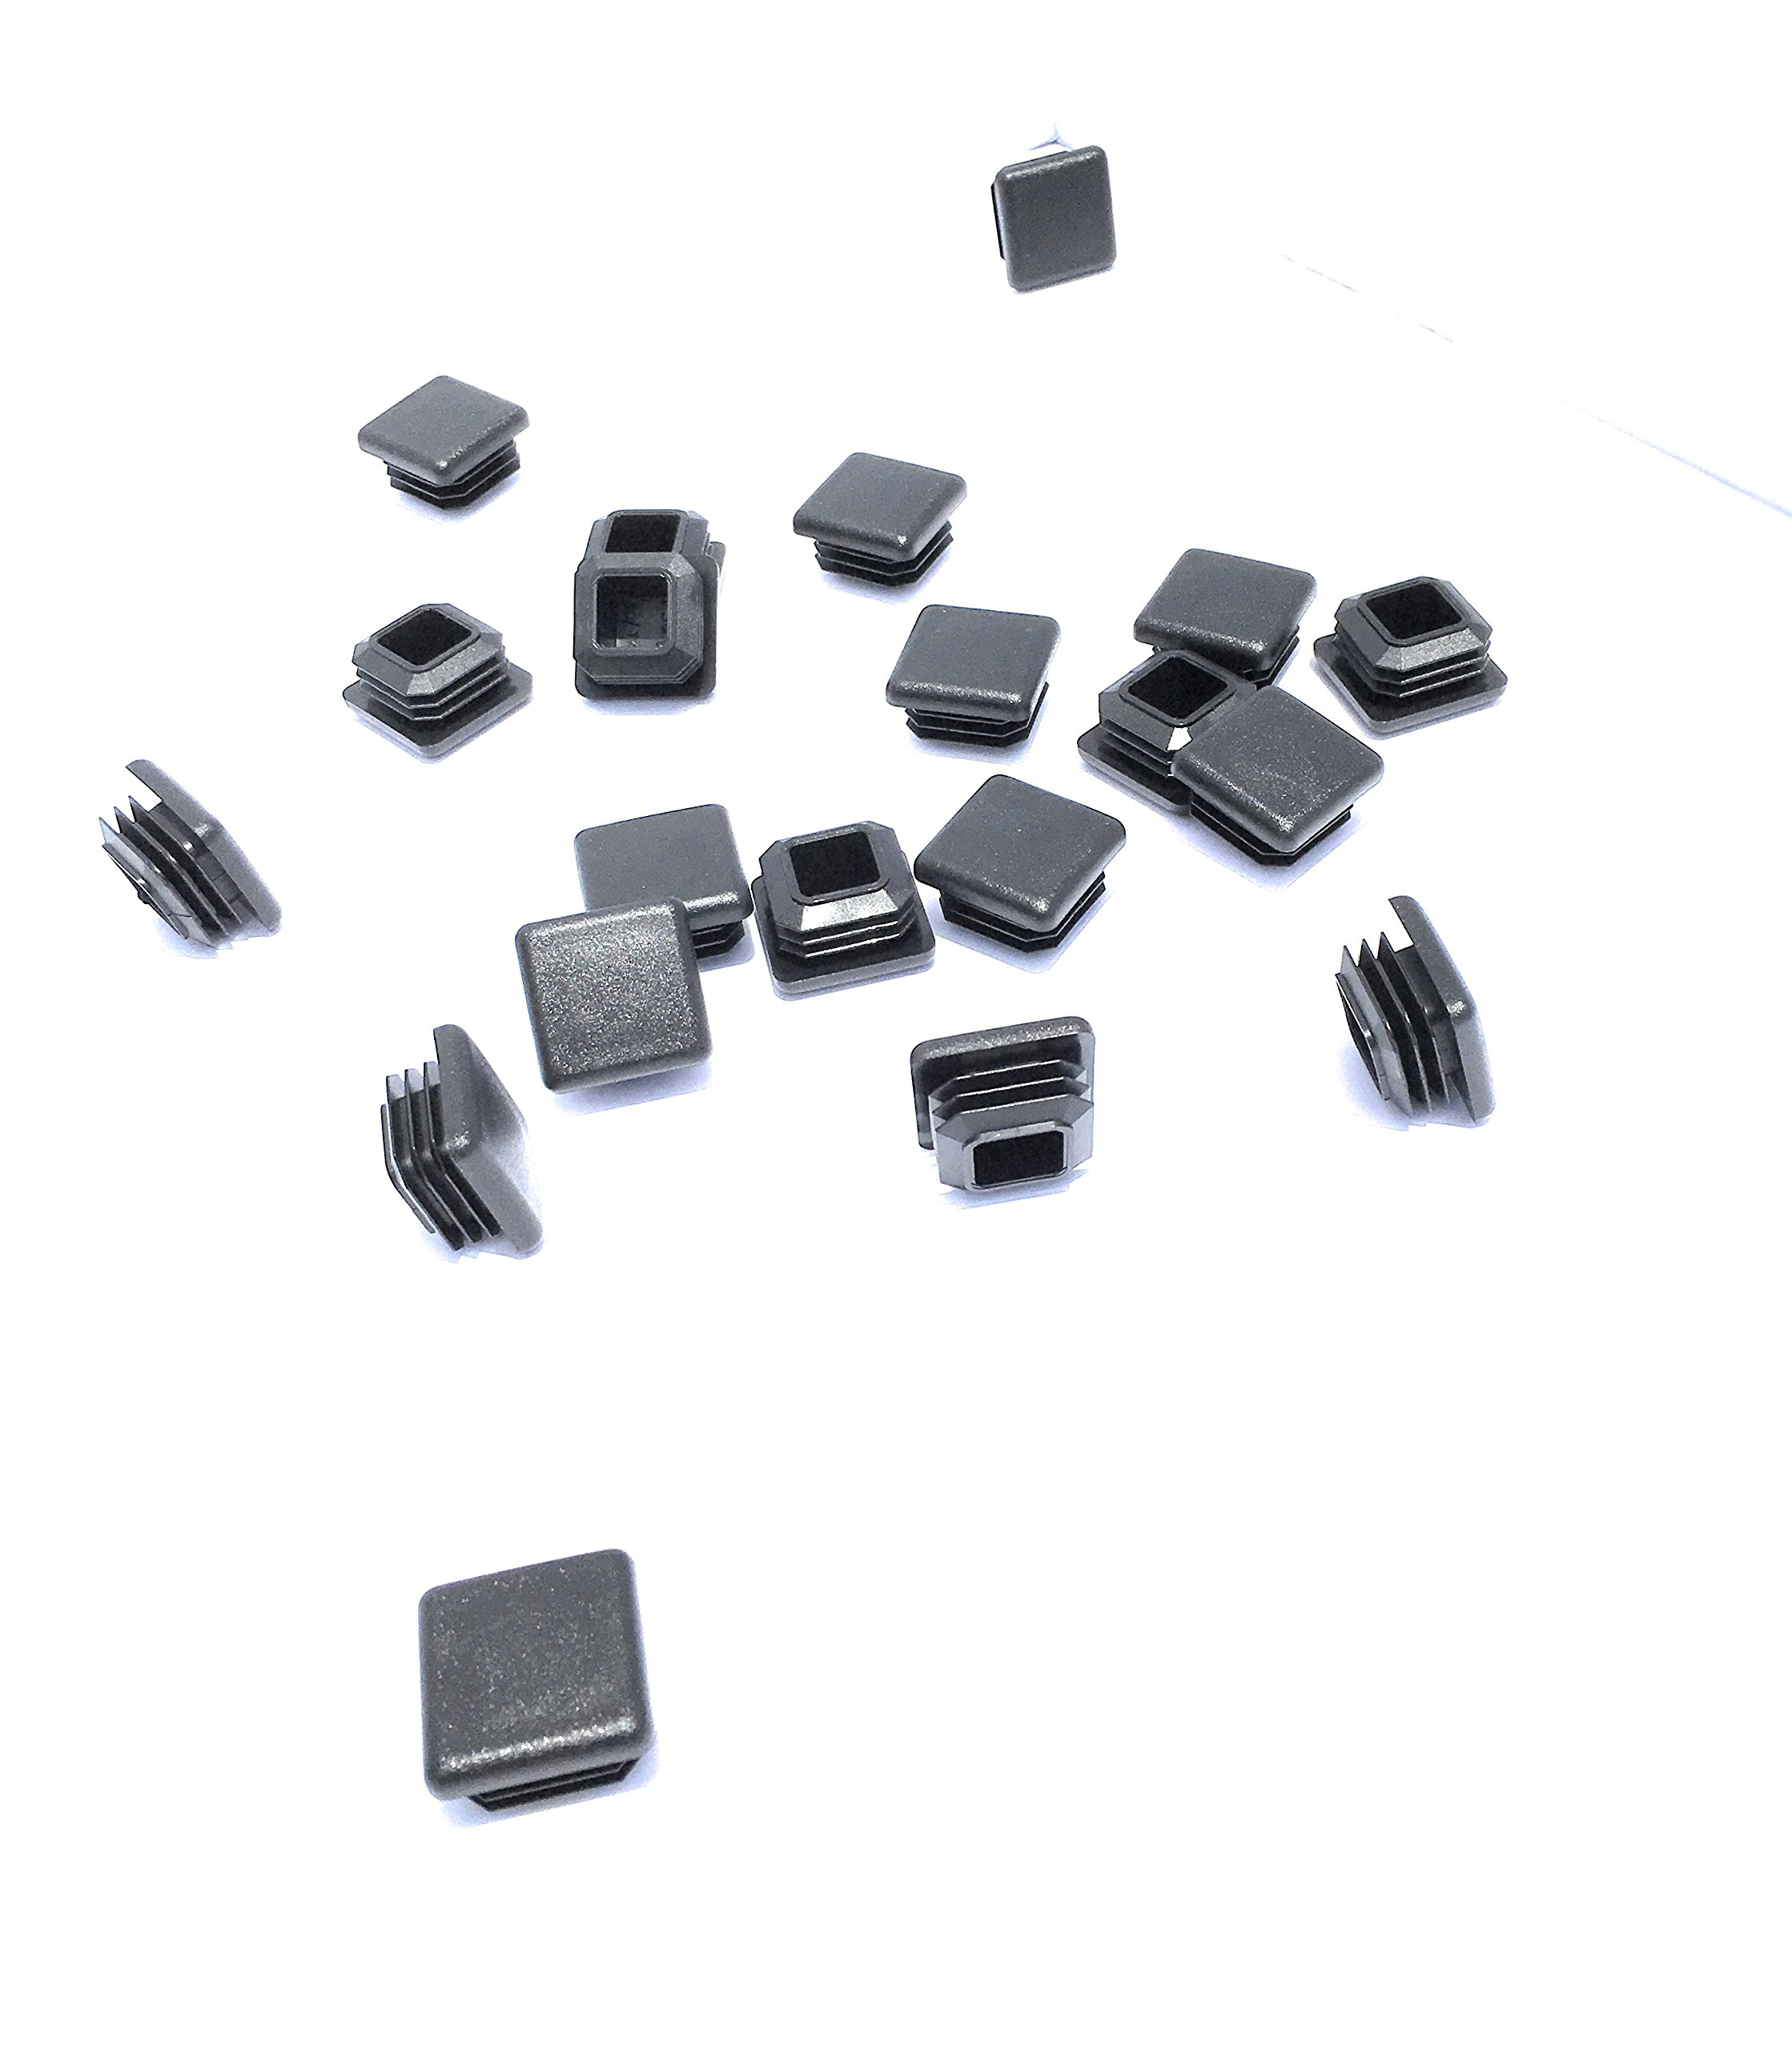 (20 Pack) 1''x1'' Square Black Plastic Polyethylene Plug